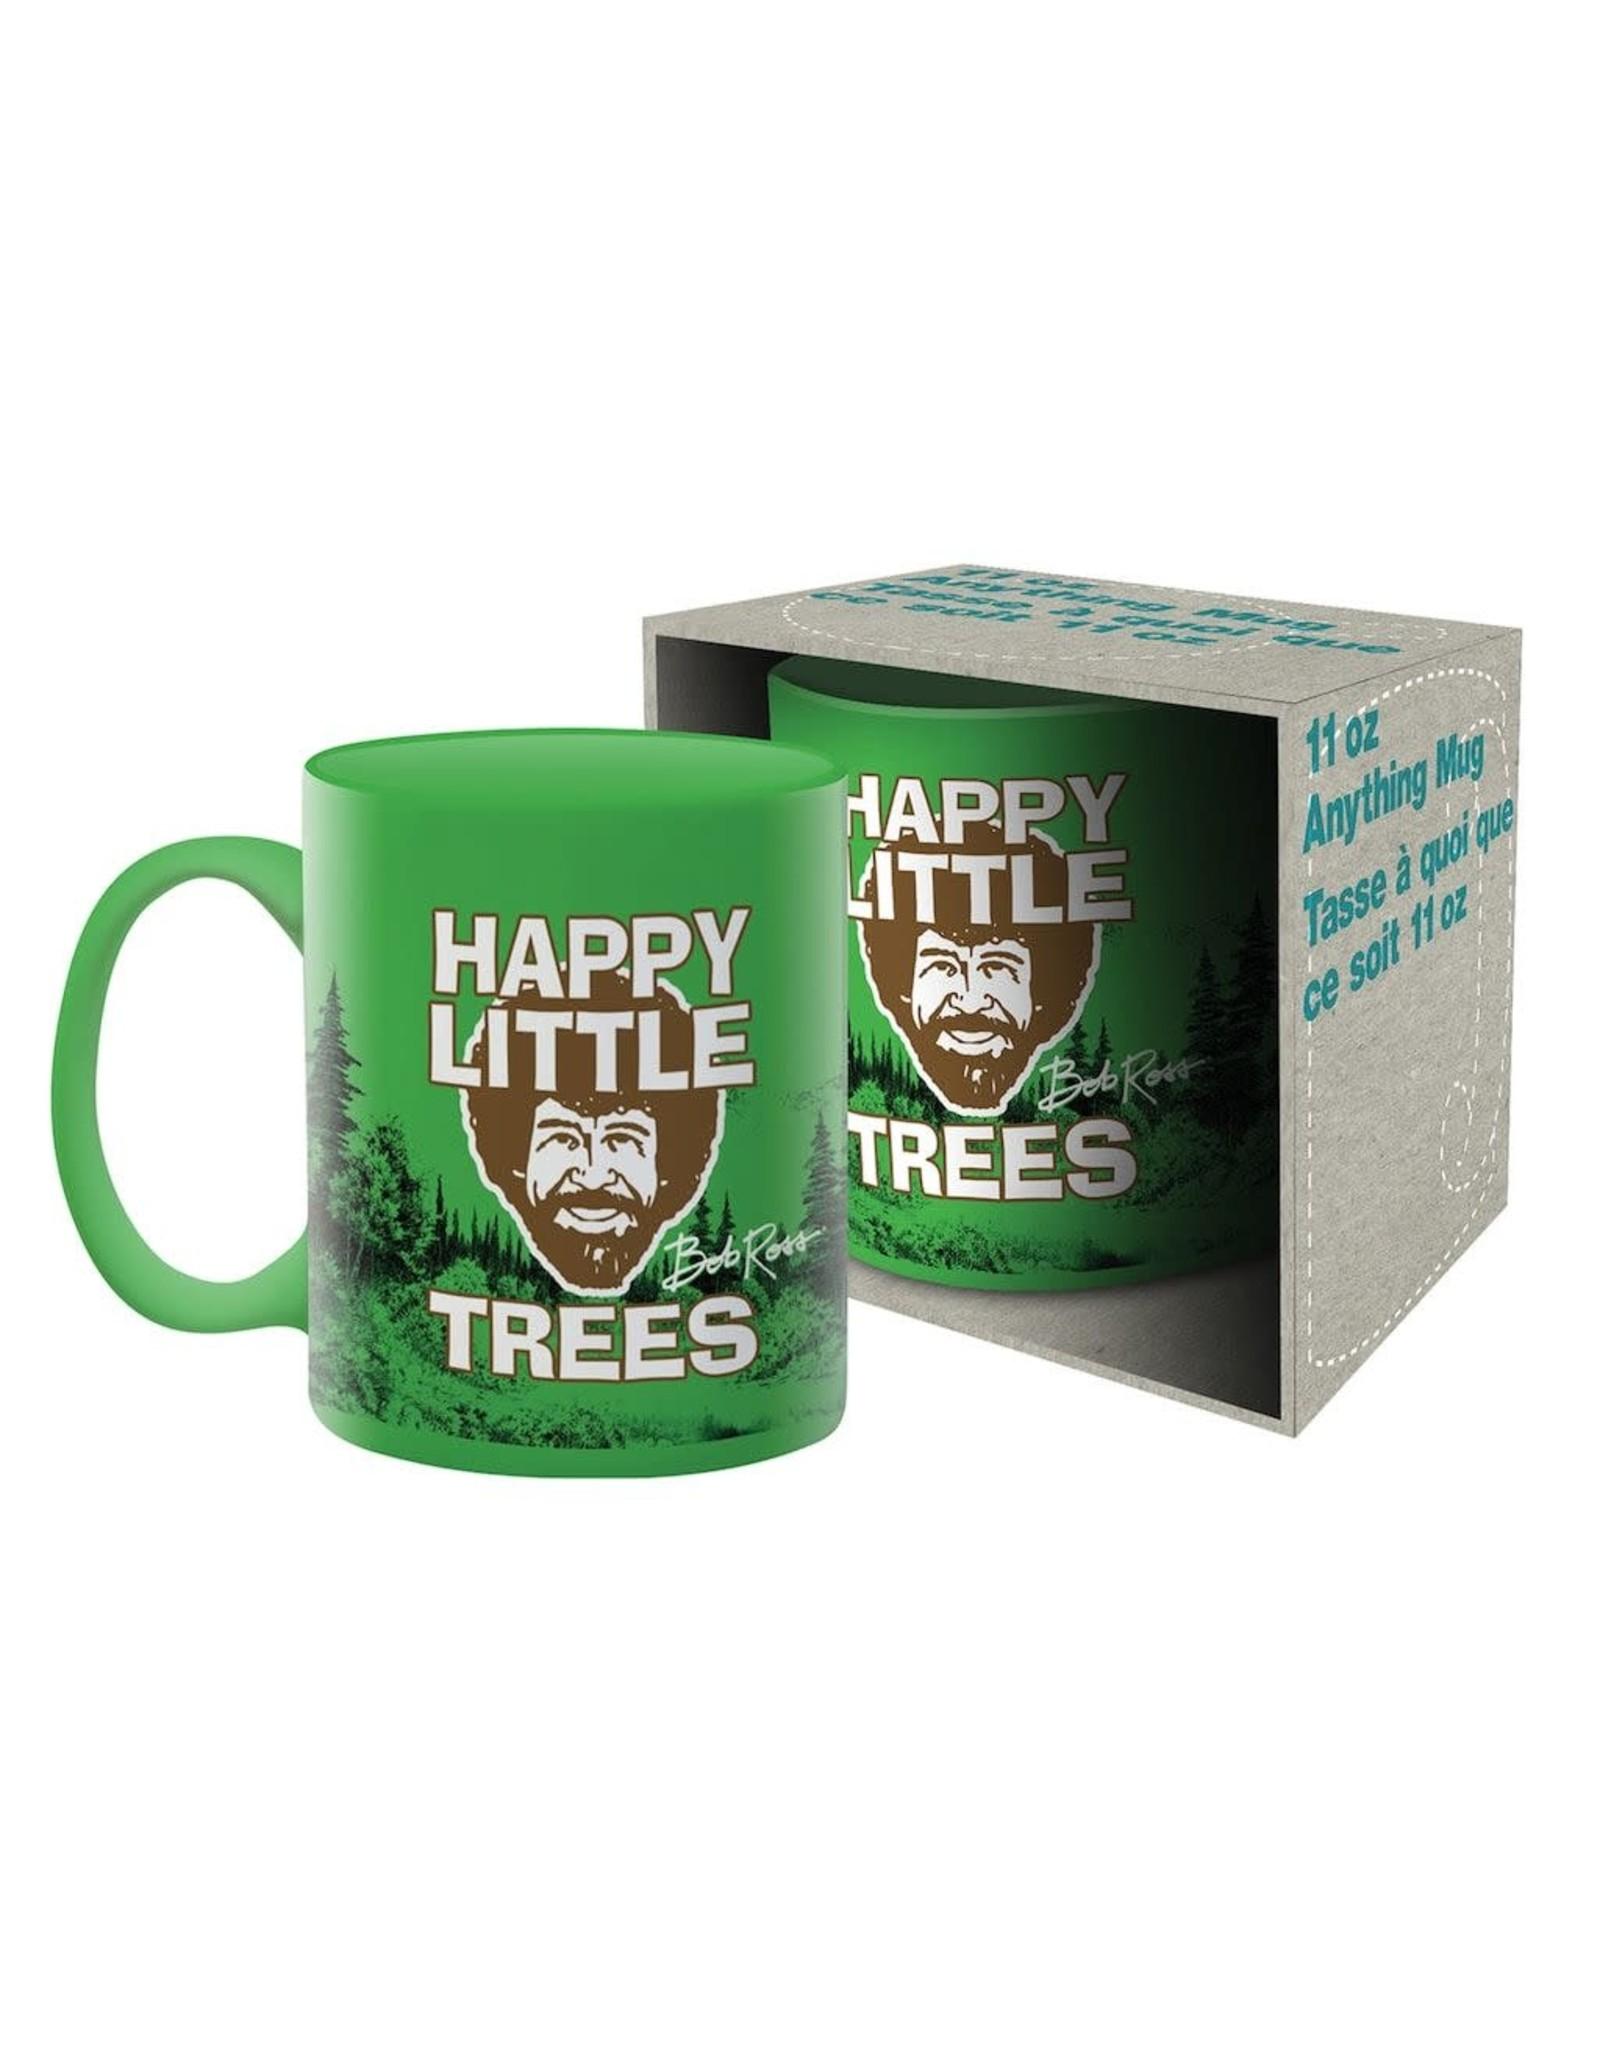 NMR Bob Ross Happy Little Trees Mug